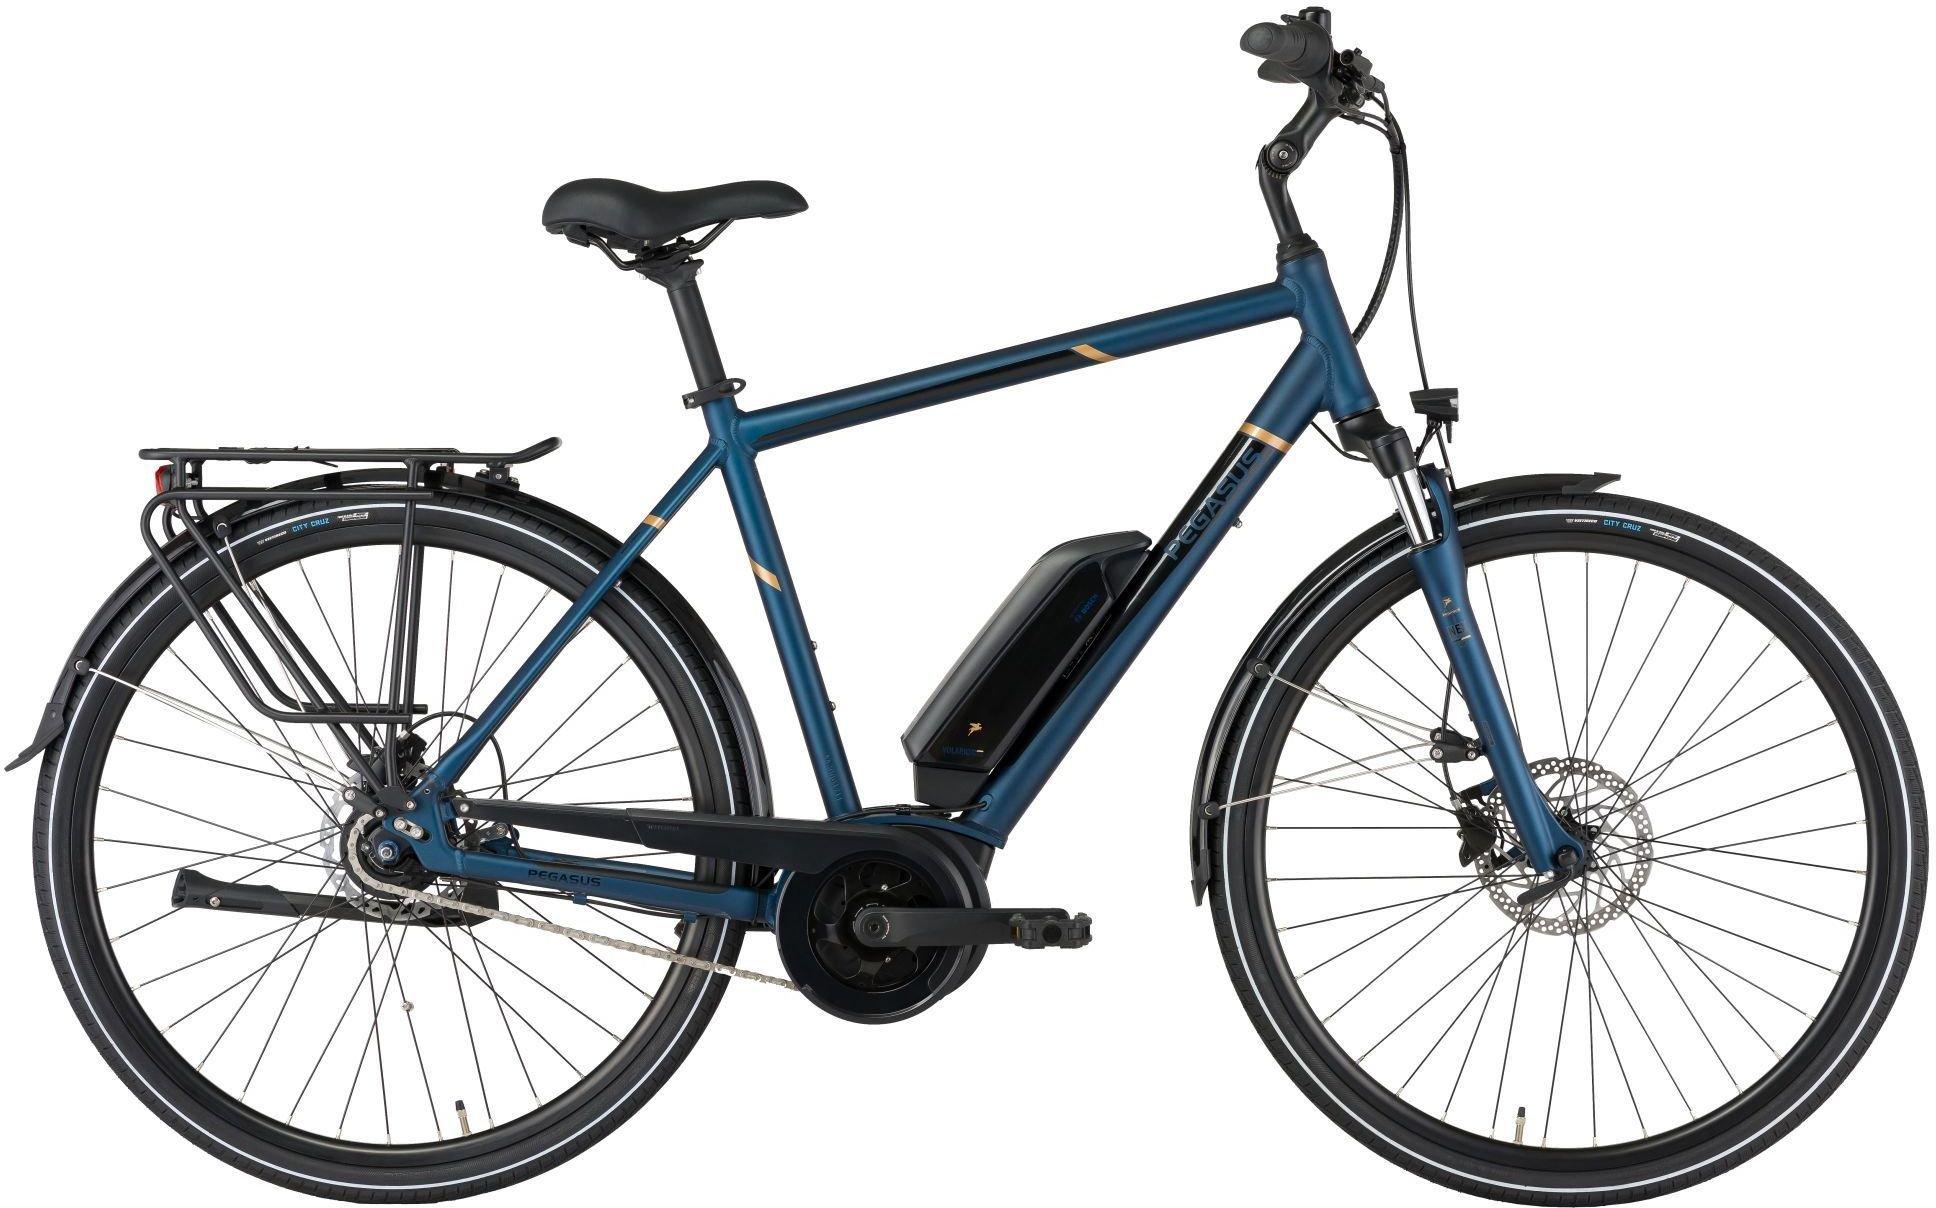 E-Bikes/Citybikes: Diamant  Ancura E8R Disc (500 Wh) 8 Gang Nabenschaltung Herrenfahrrad Diamant Modell 2021 28 Zoll 50 cm